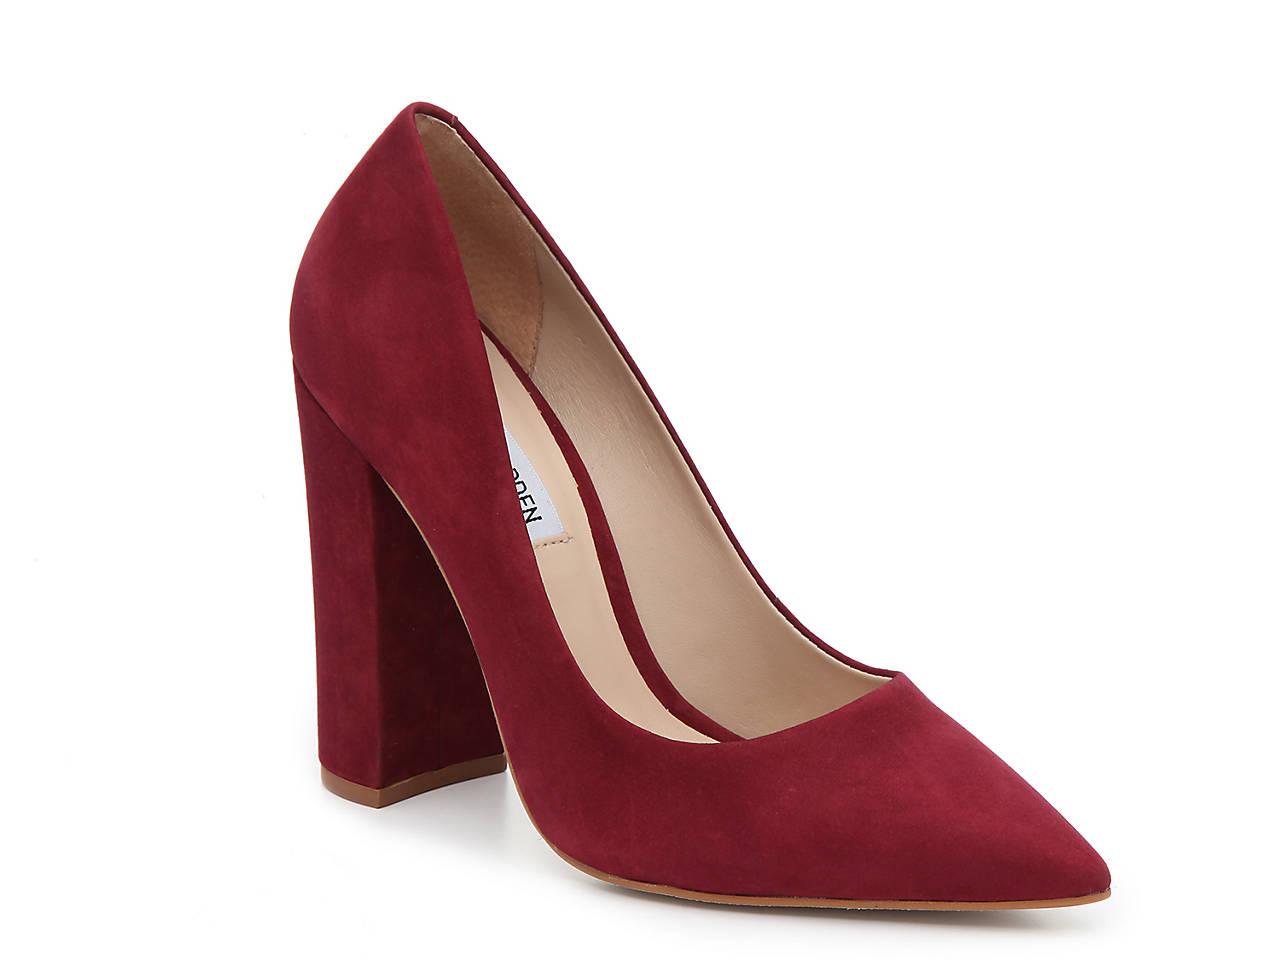 4acb5644162f Steve Madden Prance Pump Women s Shoes